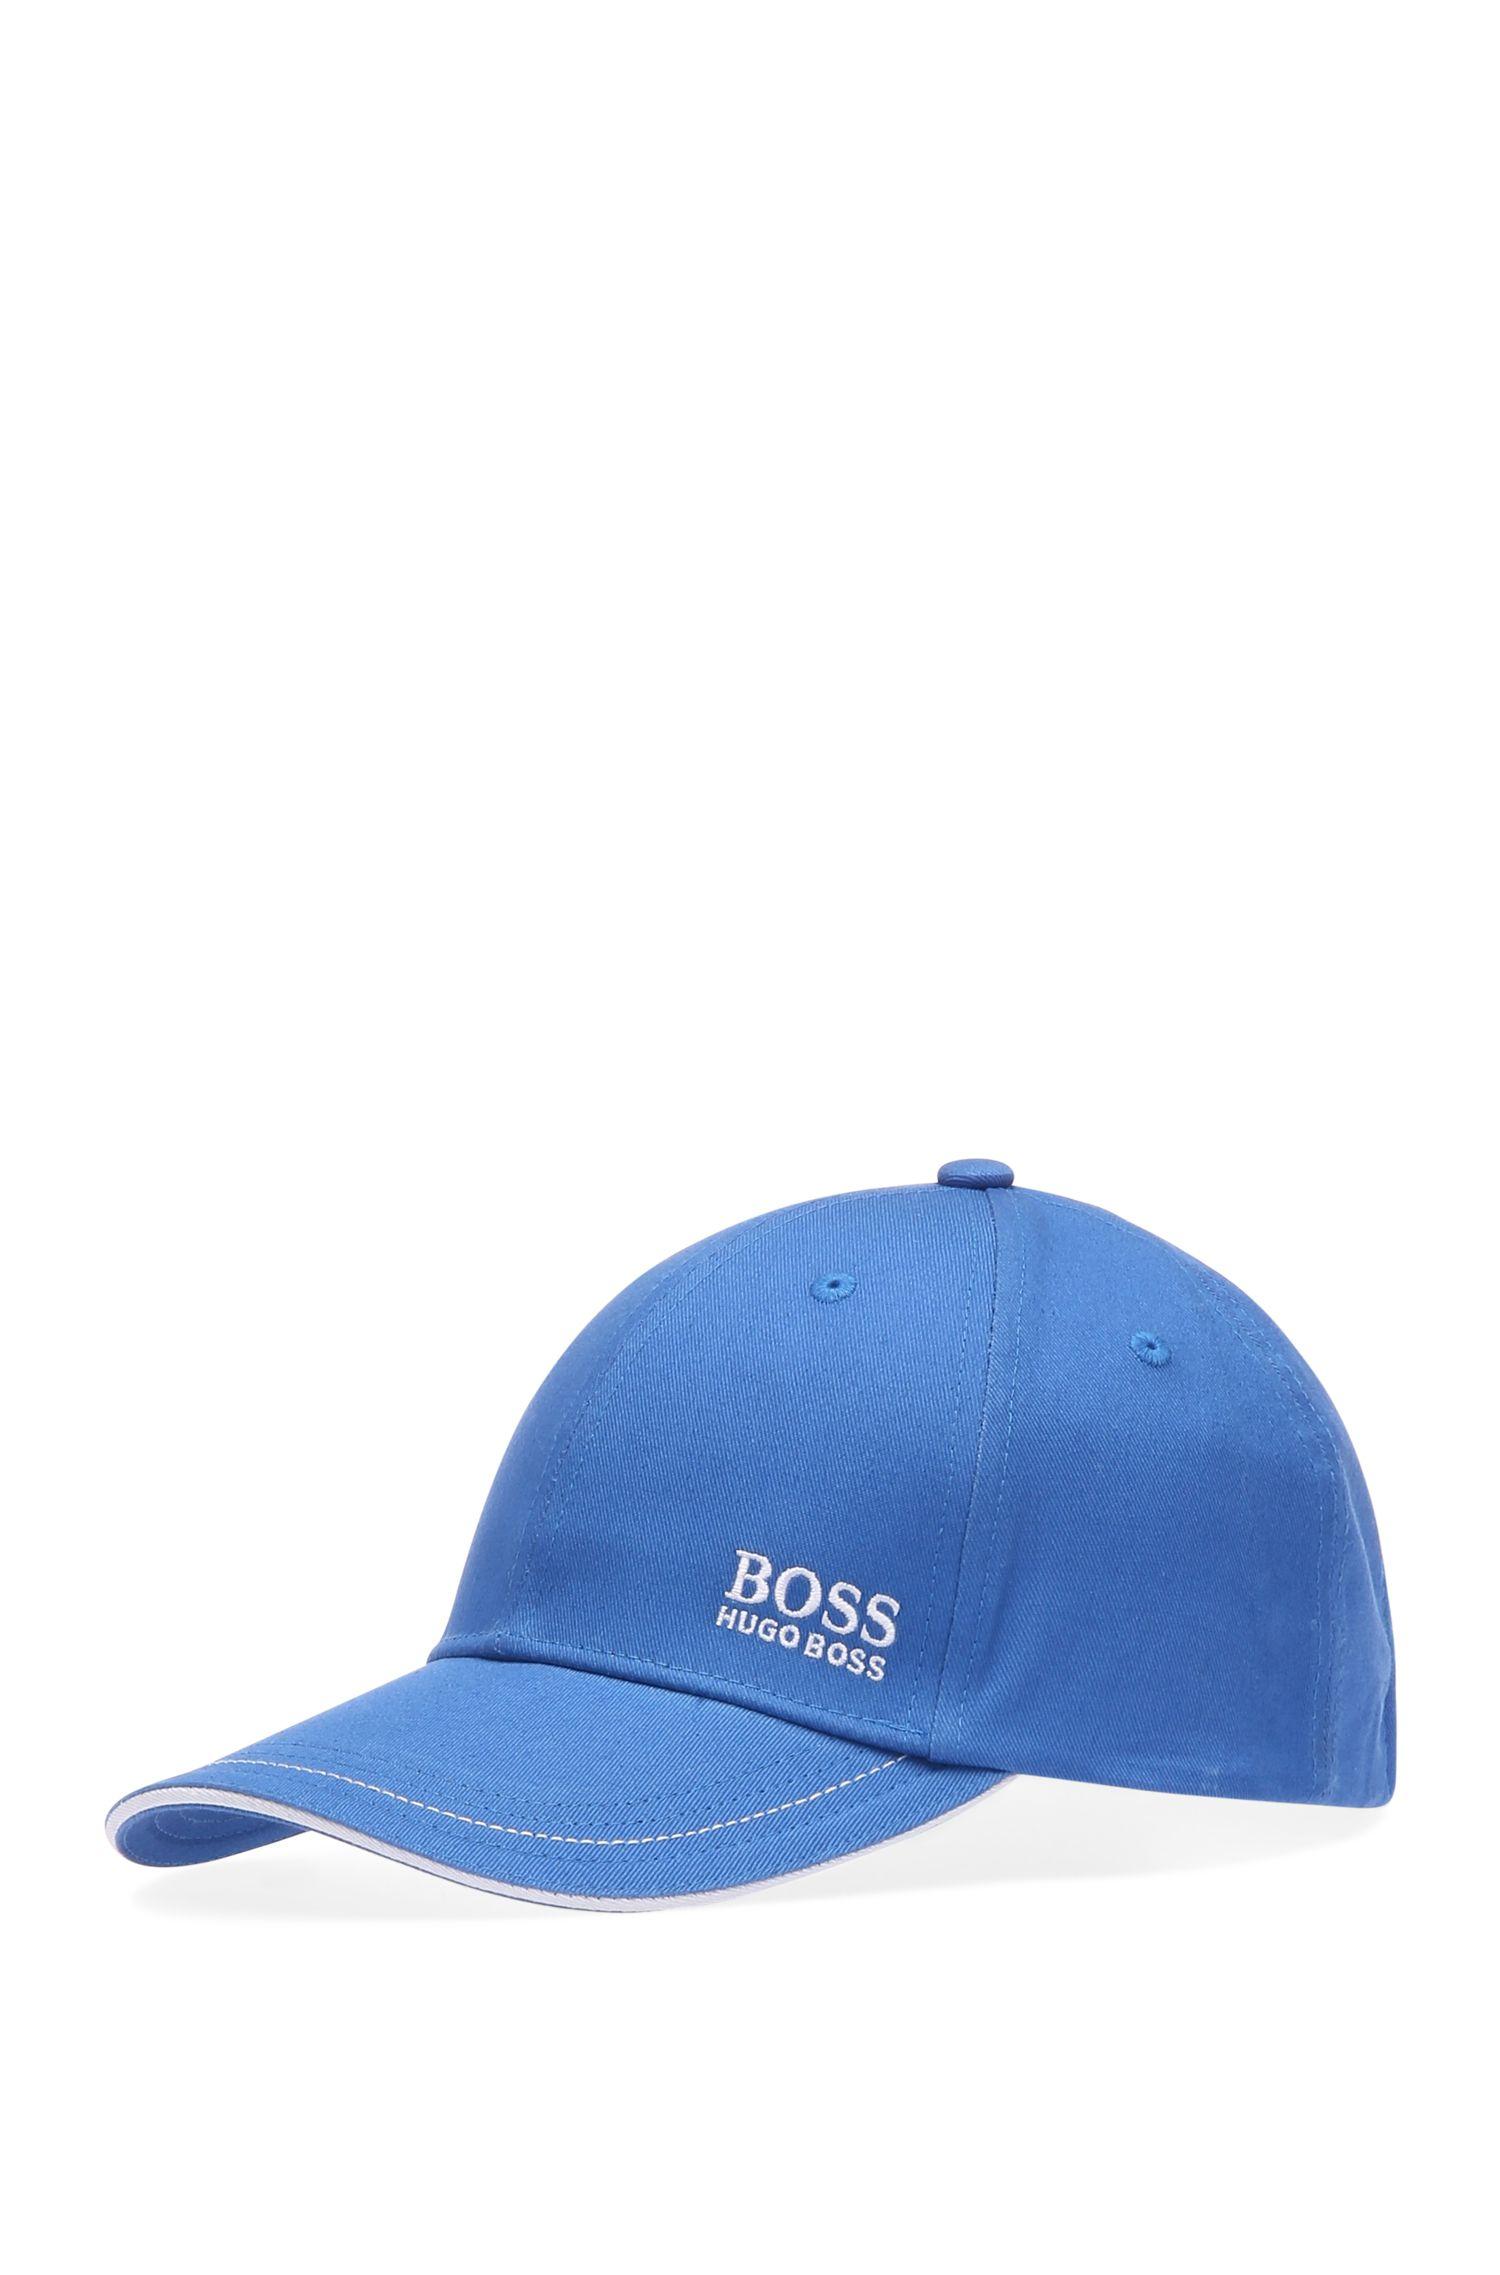 'Cap' | Cotton Twill Hat